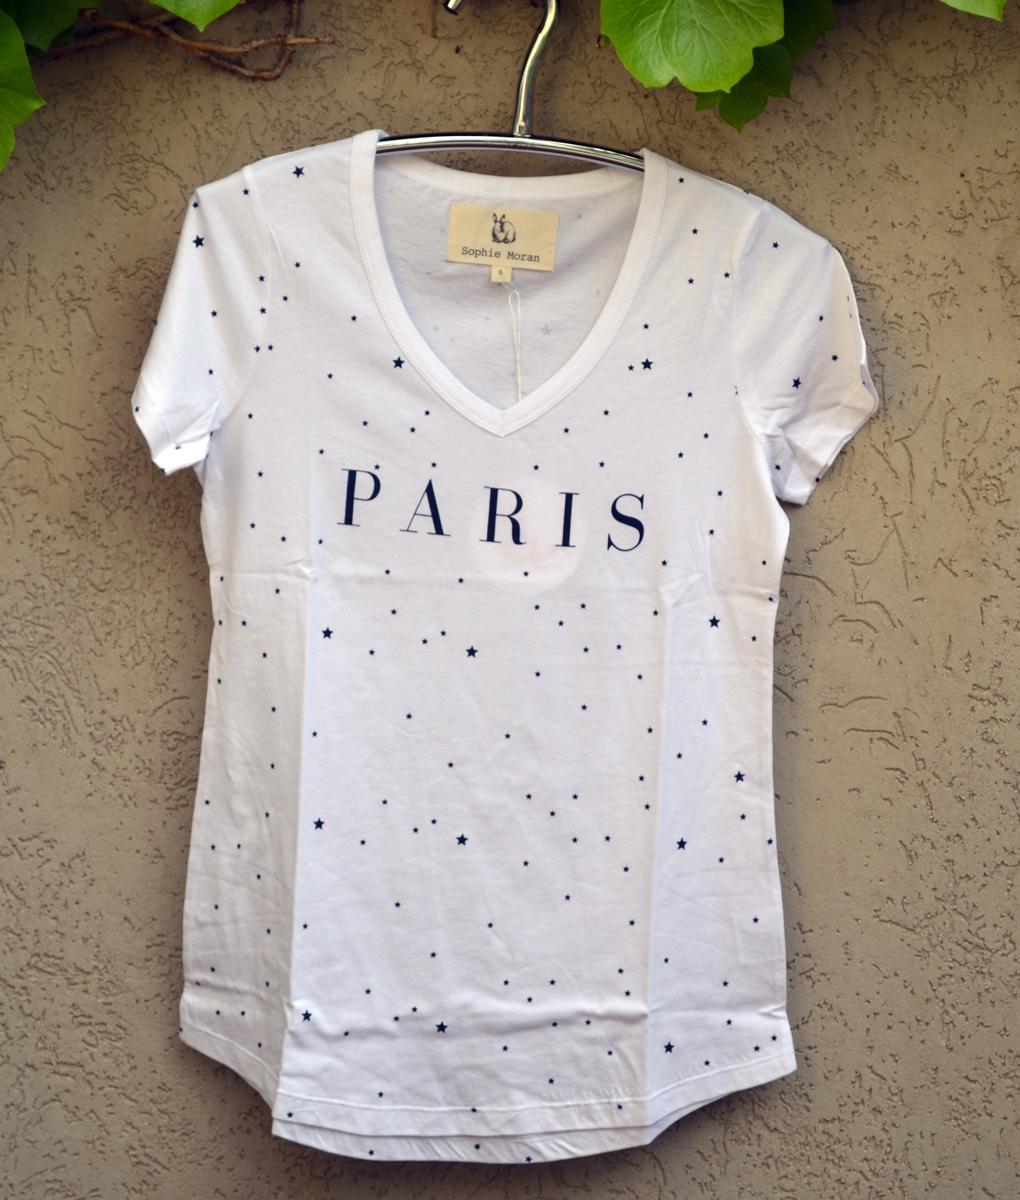 T'shirt white paris stars